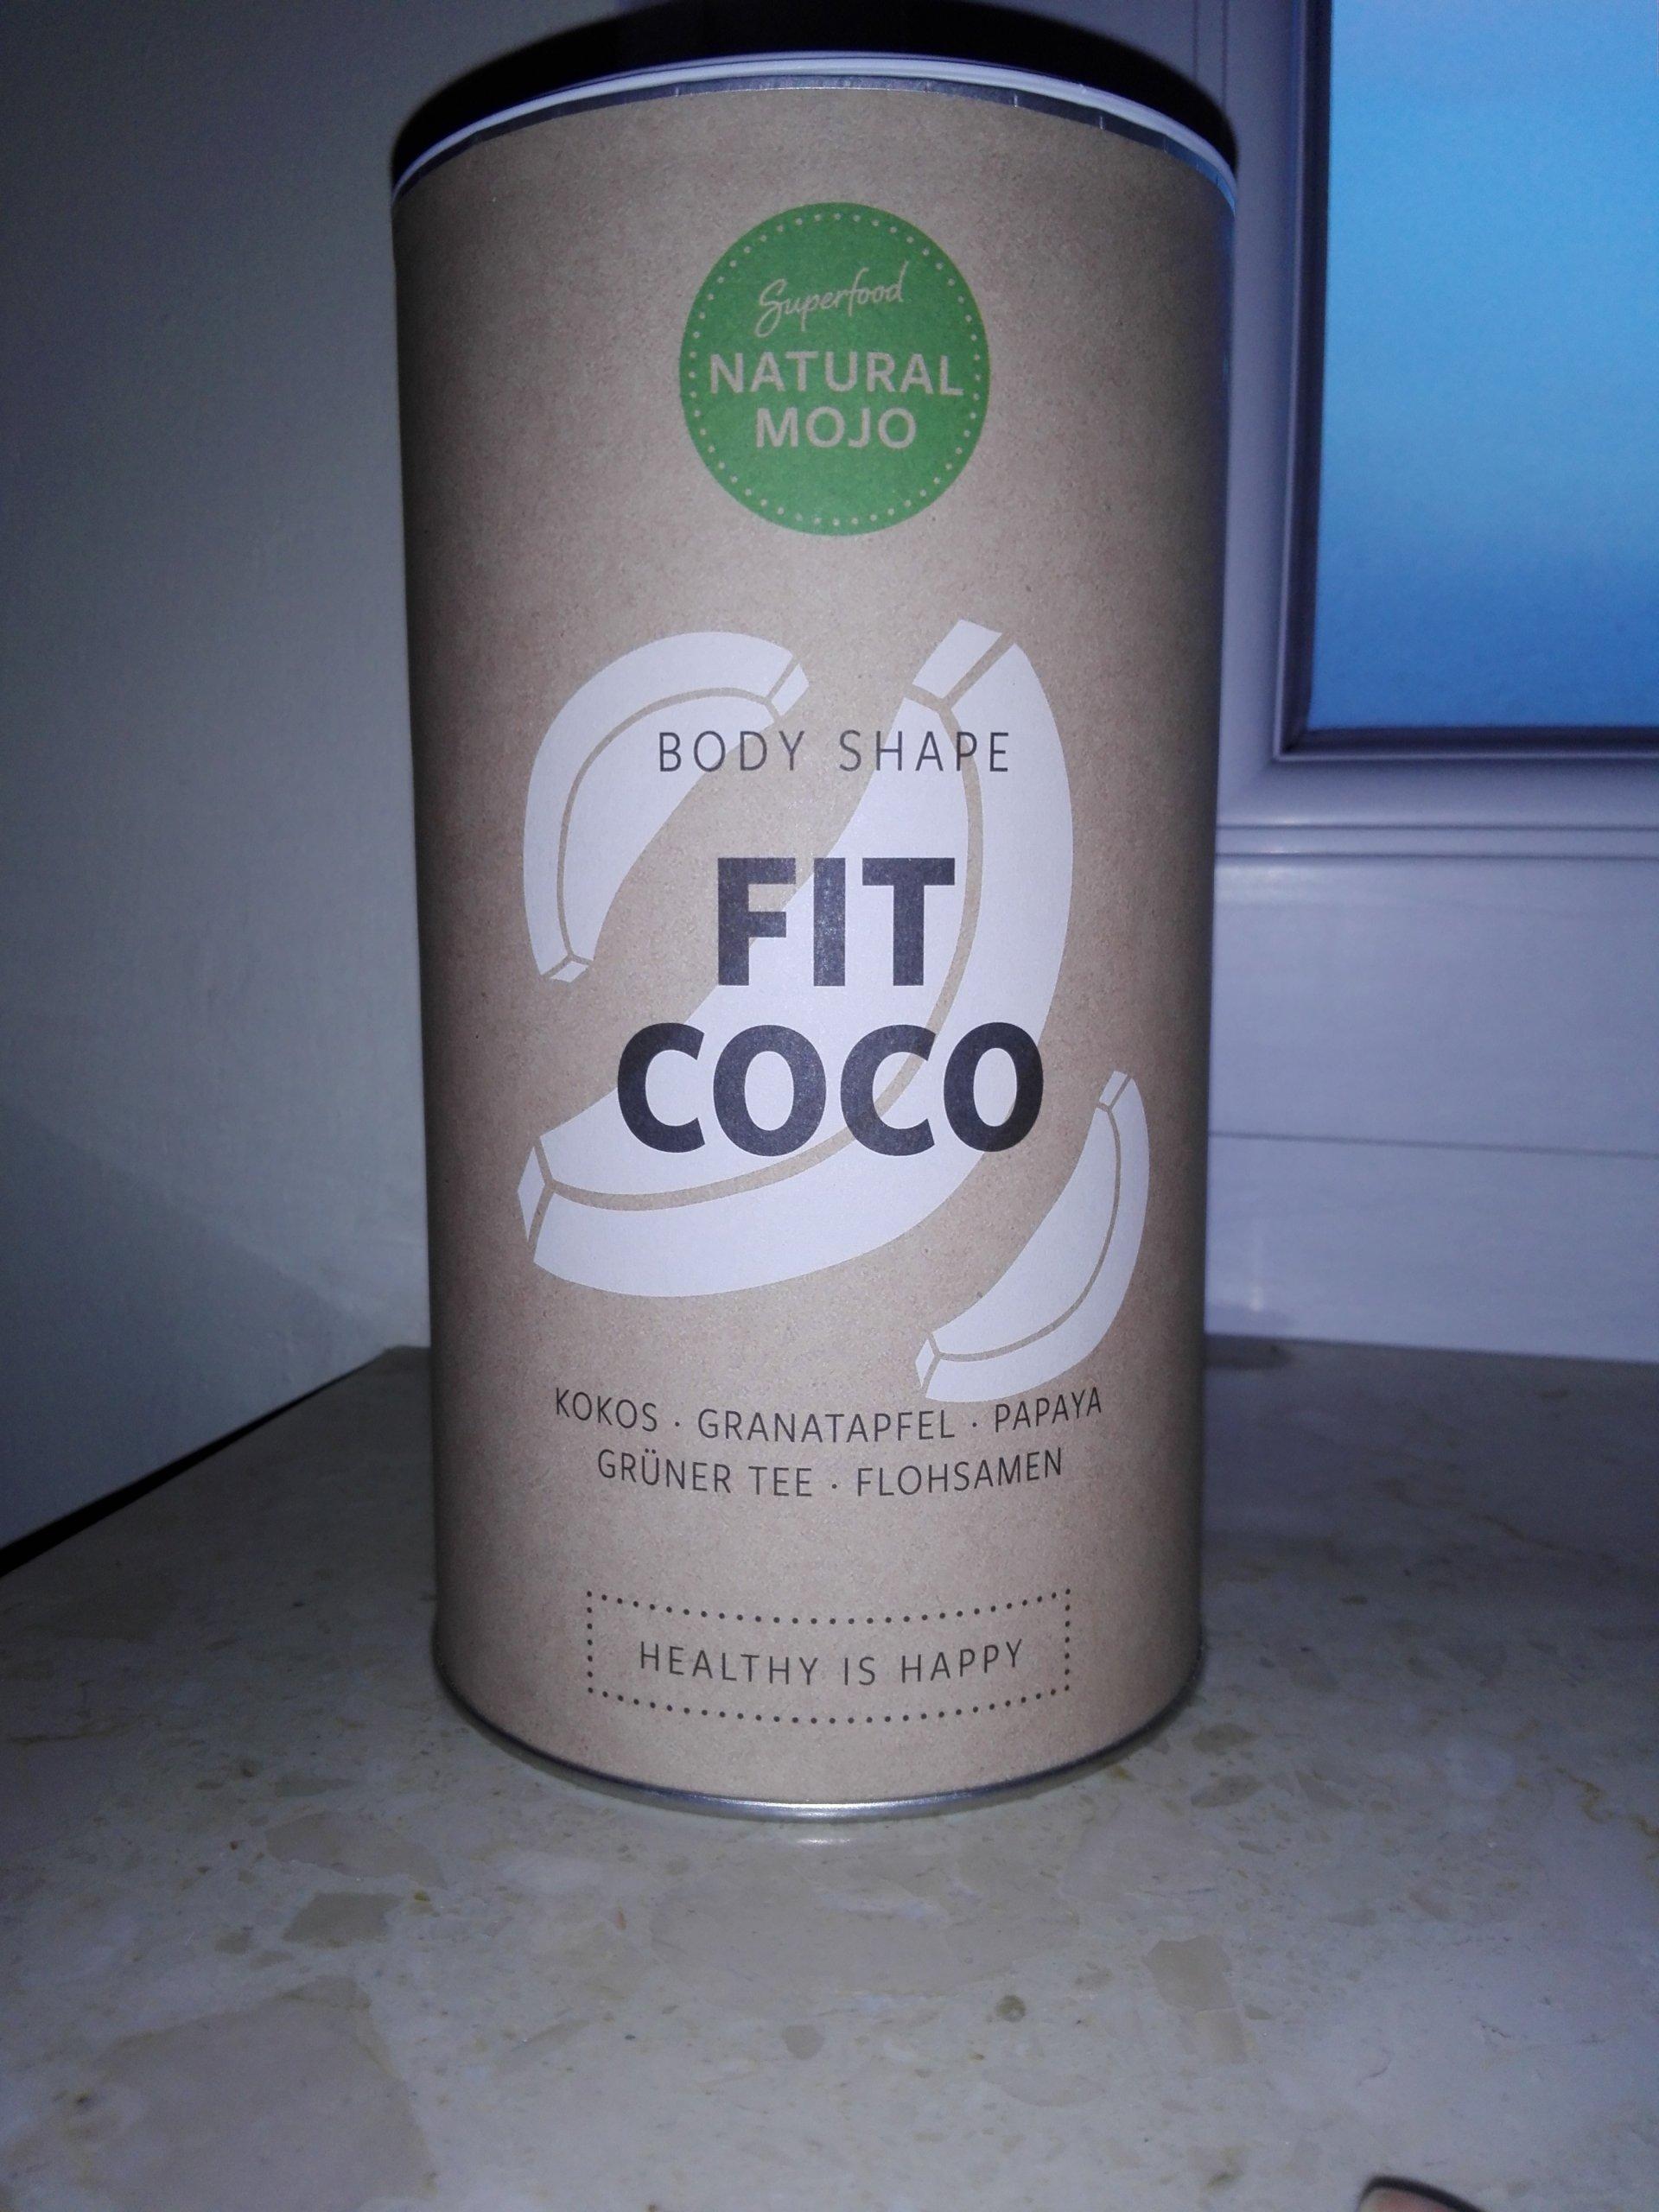 Natural Mojo Fit Coco mieszanka białkowa i superfo